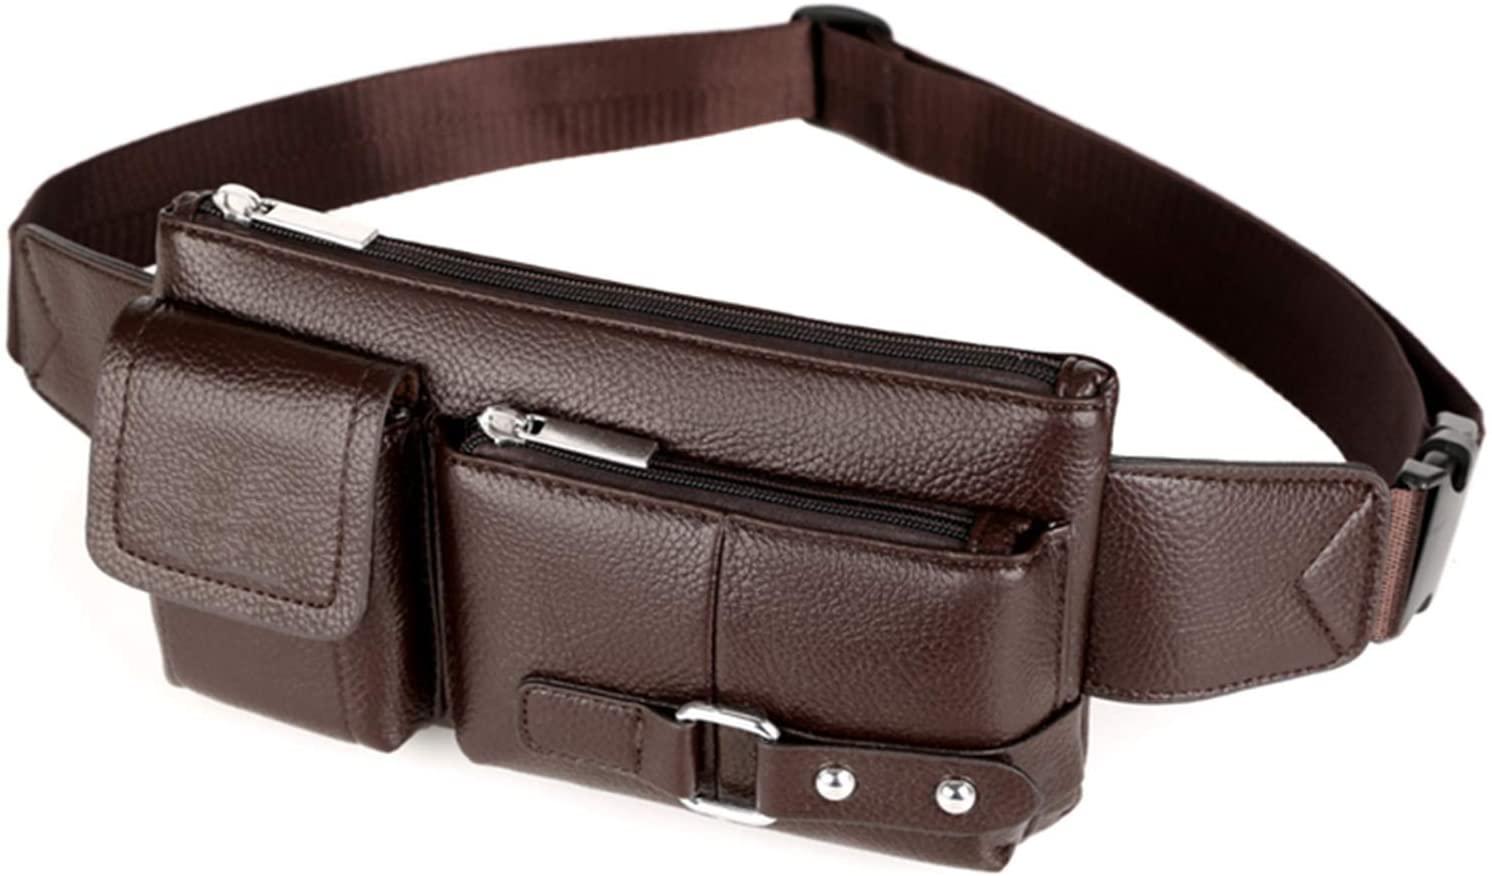 Luxury Waist Bag Men Leather Fanny Pack Chest Bag Male Casual Belt Bags Sling Crossbody Bum Bag Belly Waist Packs Heuptas,Brown